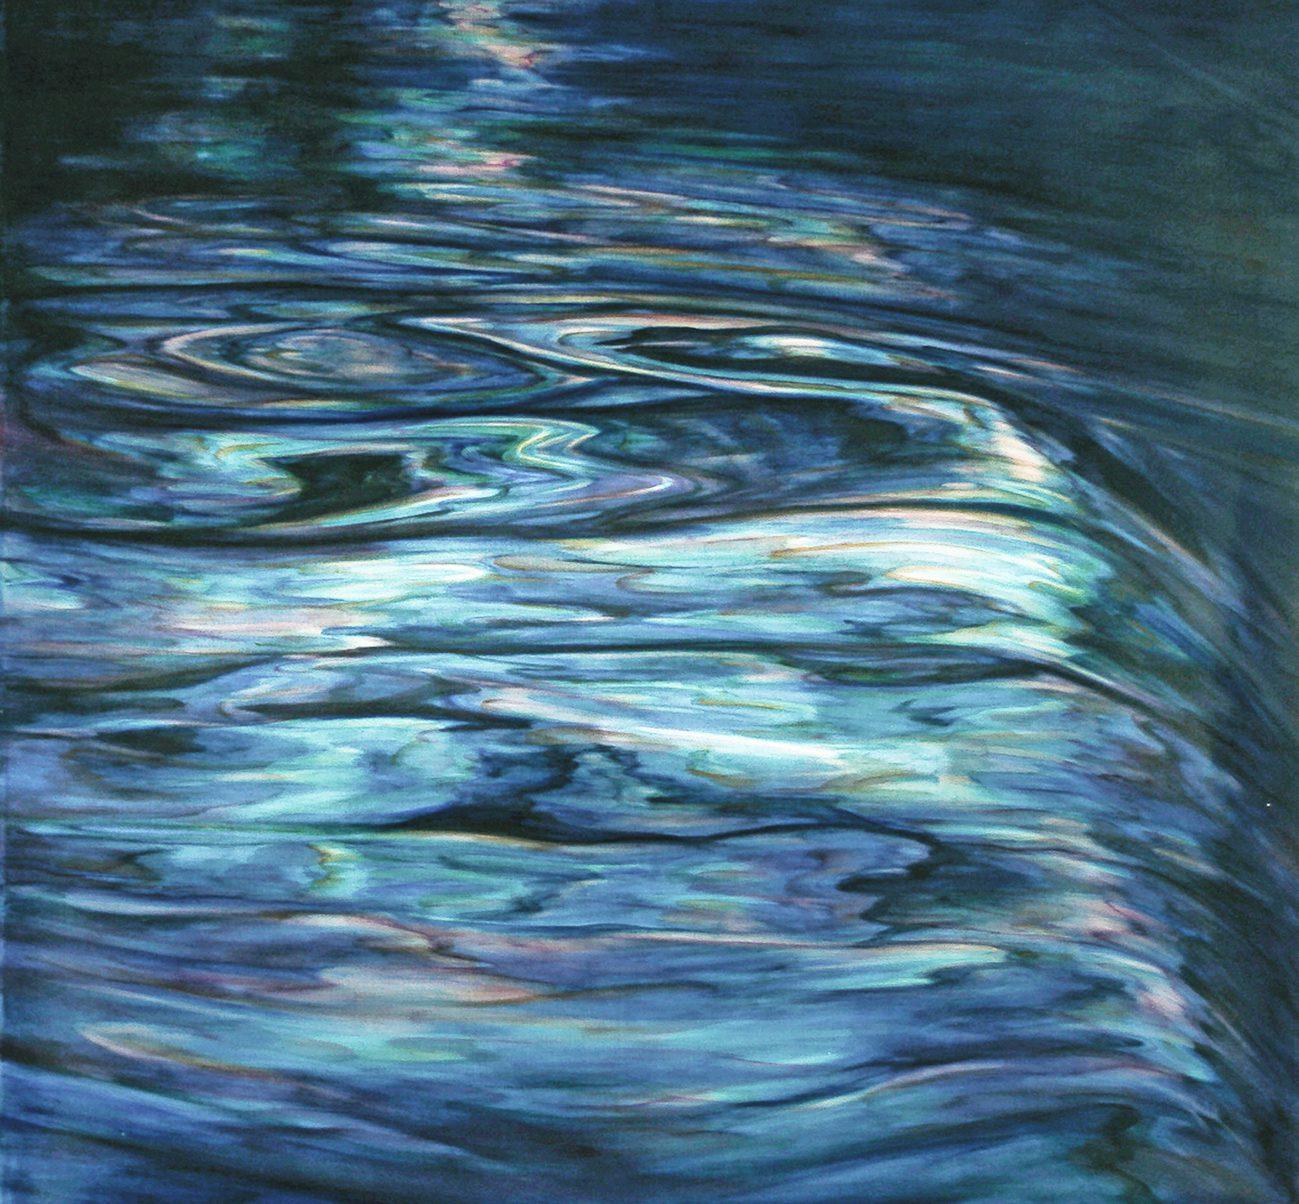 L'Arno 4, 2013. Oil on canvas, 93 x 83 cm